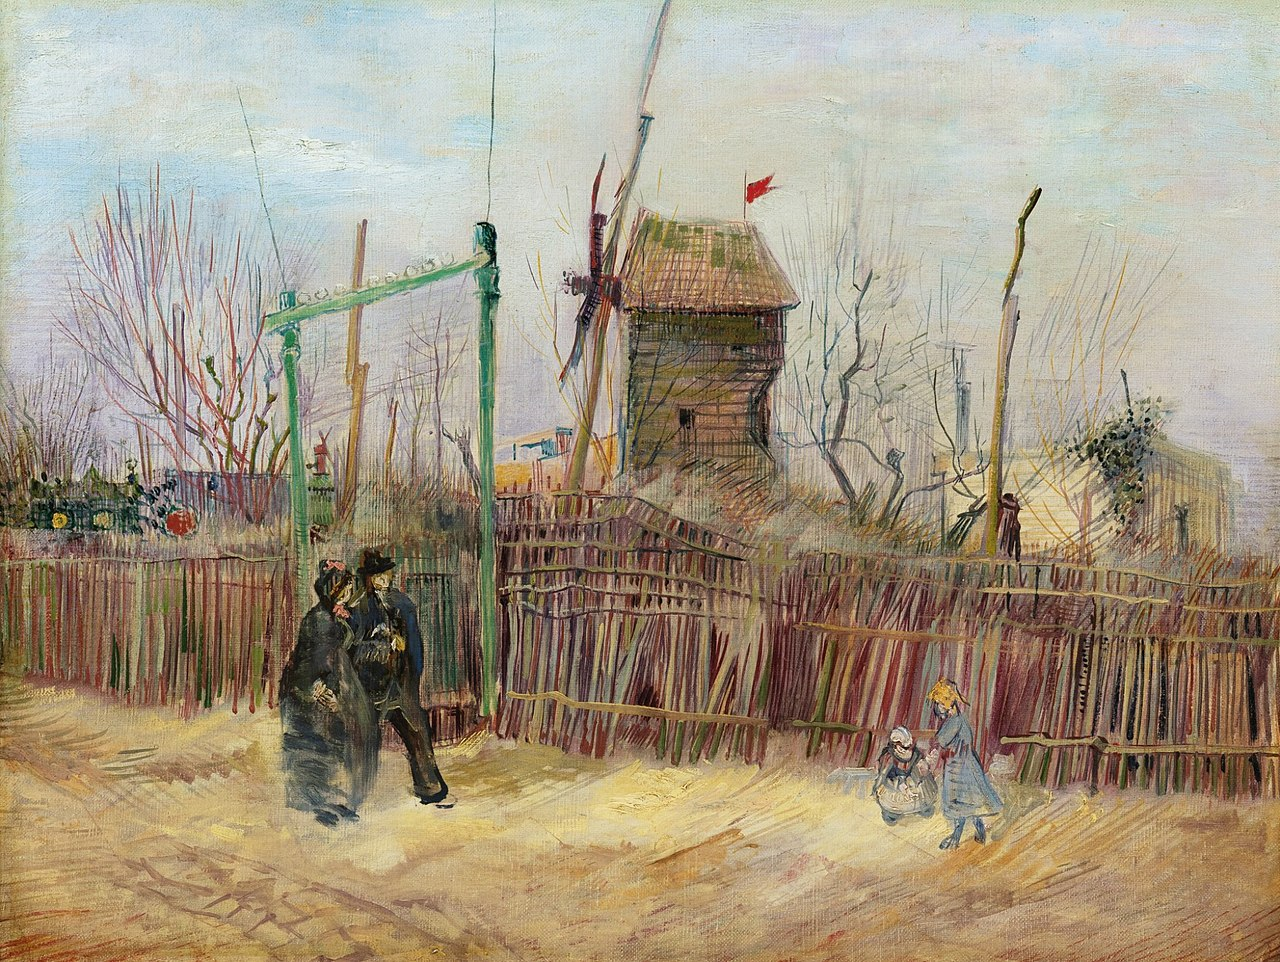 La storia dietro Scène de rue à Montmartre, l'opera di van Gogh mai esposta al pubblico